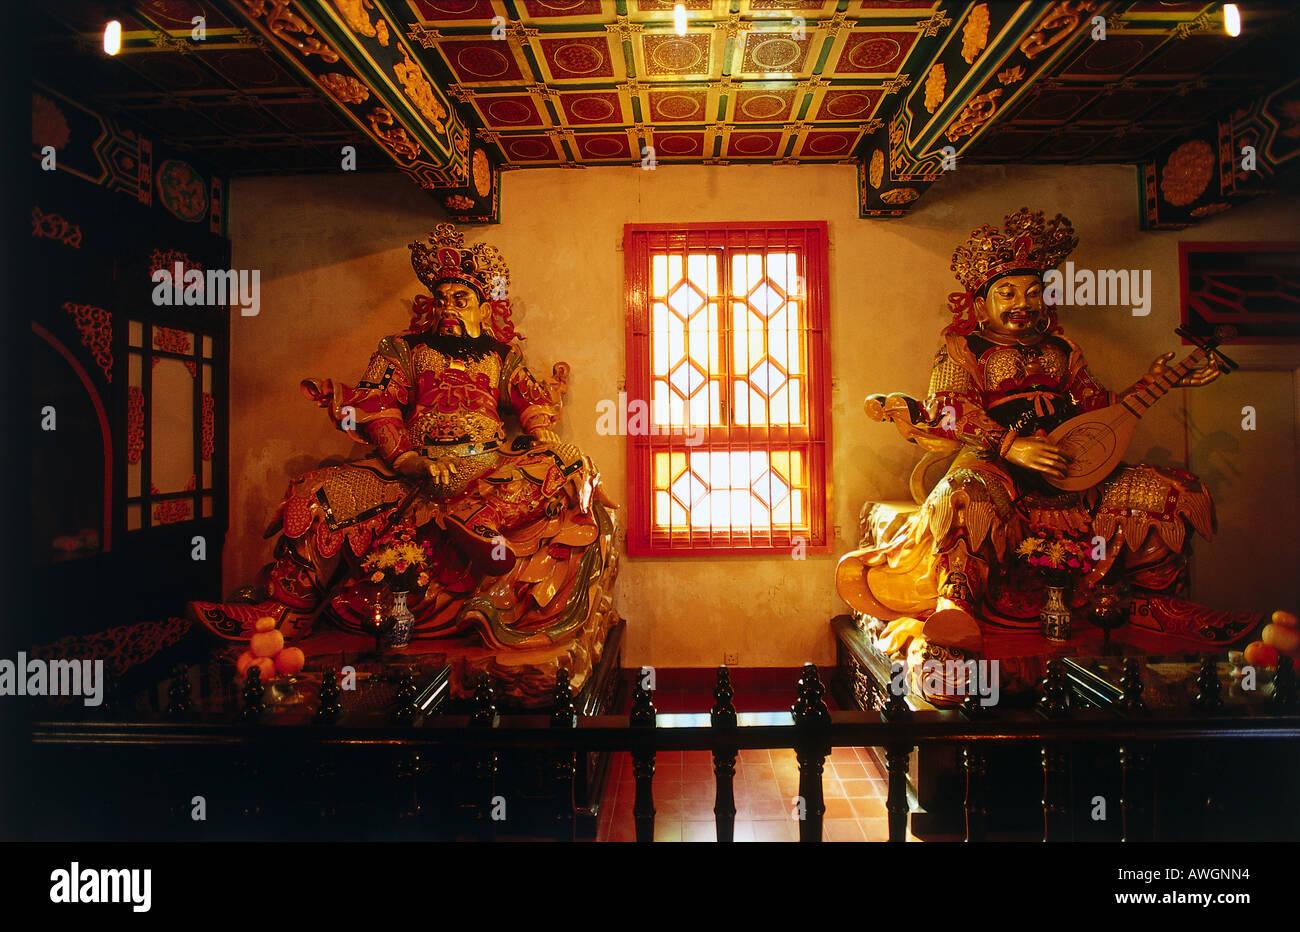 Hong Kong, Big Buddha and Po Lin Monastery, Bodhisattvas - statues of the Buddhist saints, either side of monastery window - Stock Image